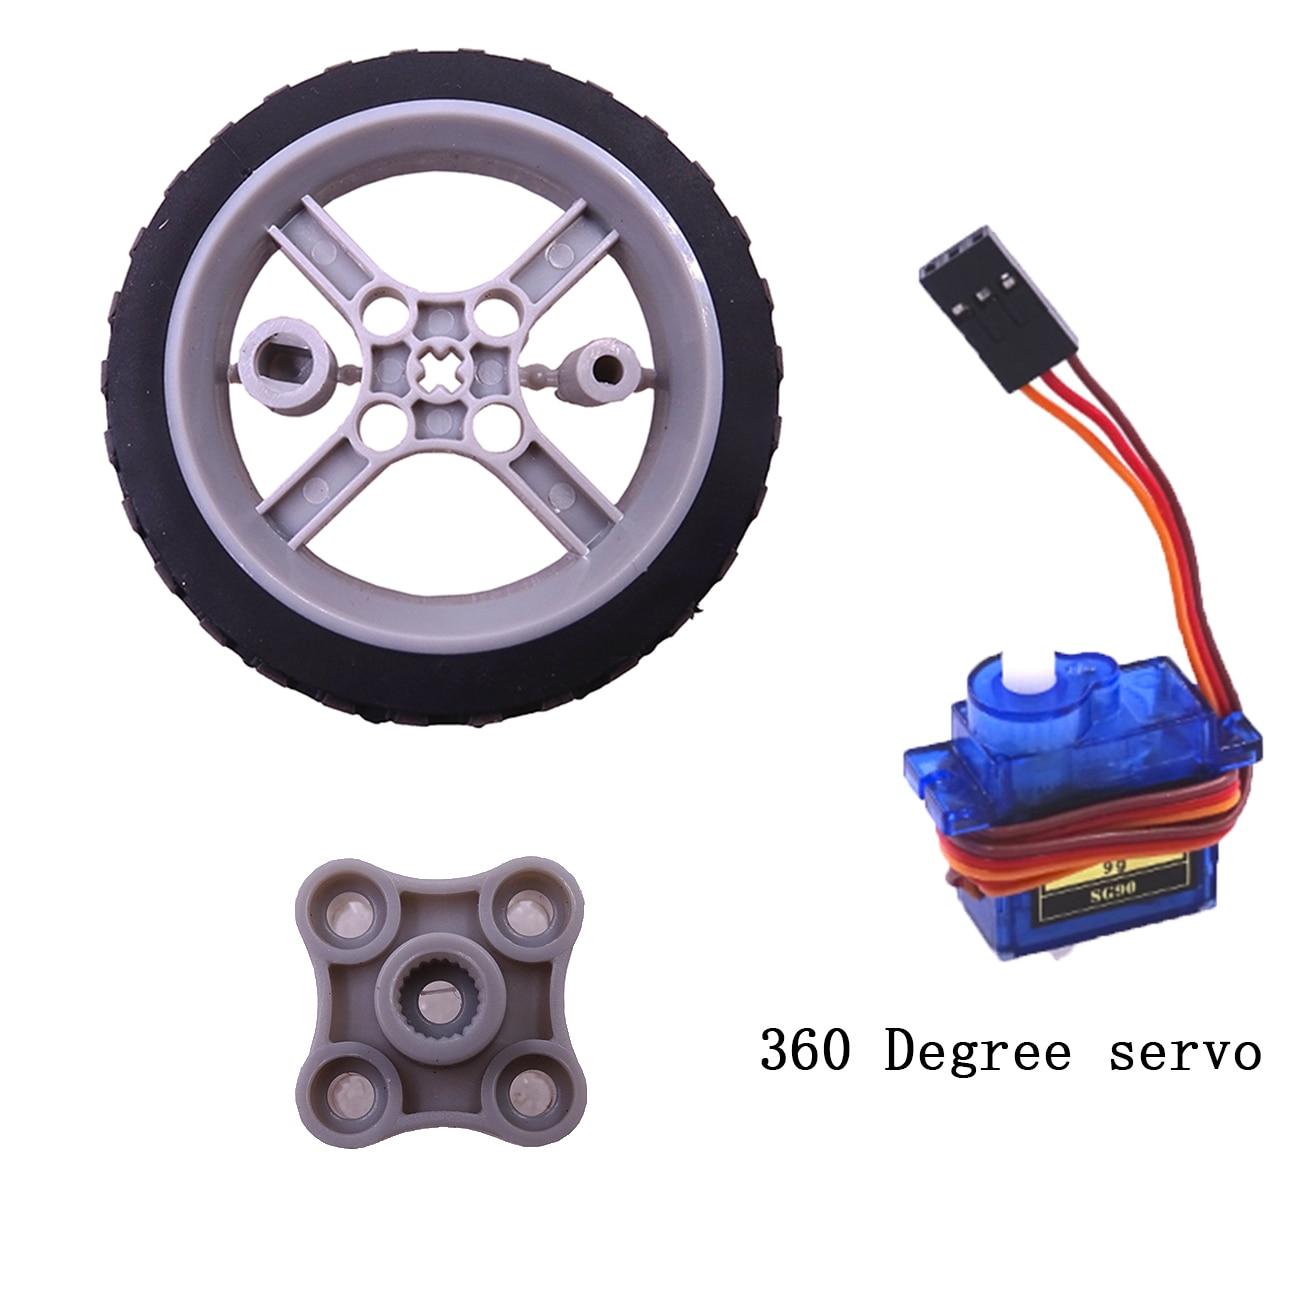 SG90 Power Kit 9G 360 Degree Continuous Rotation Servo With Servo Wheel DIY Kit